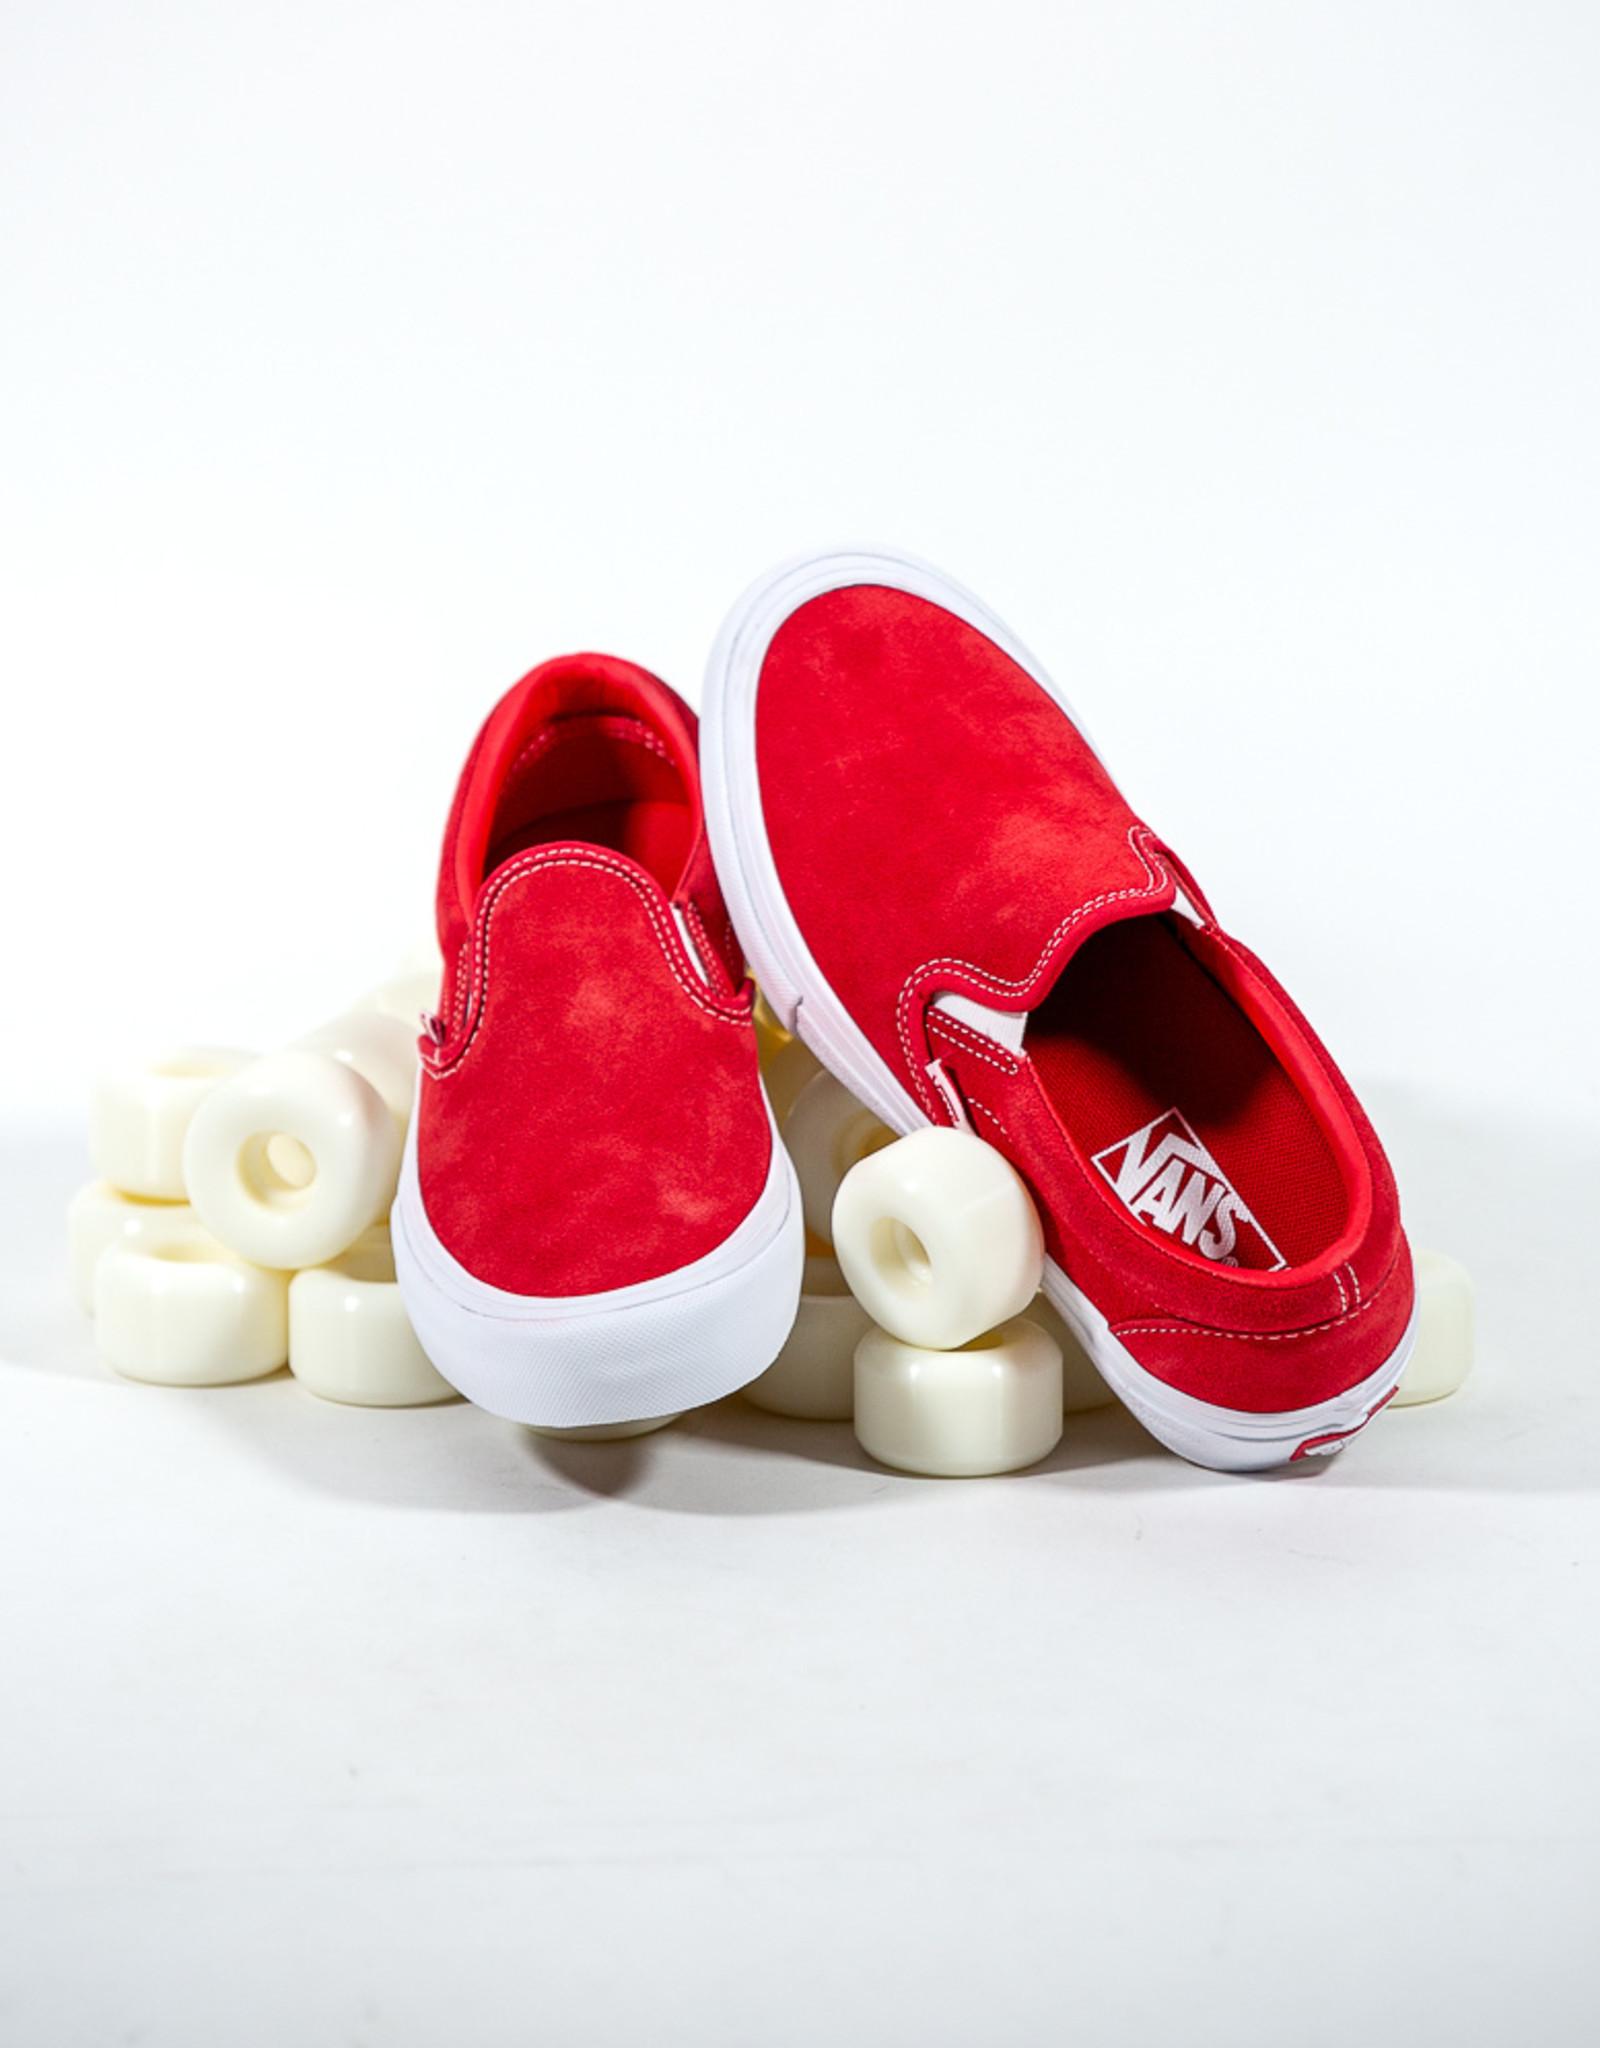 VANS VANS SLIP ON PRO - RED/WHITE SUEDE